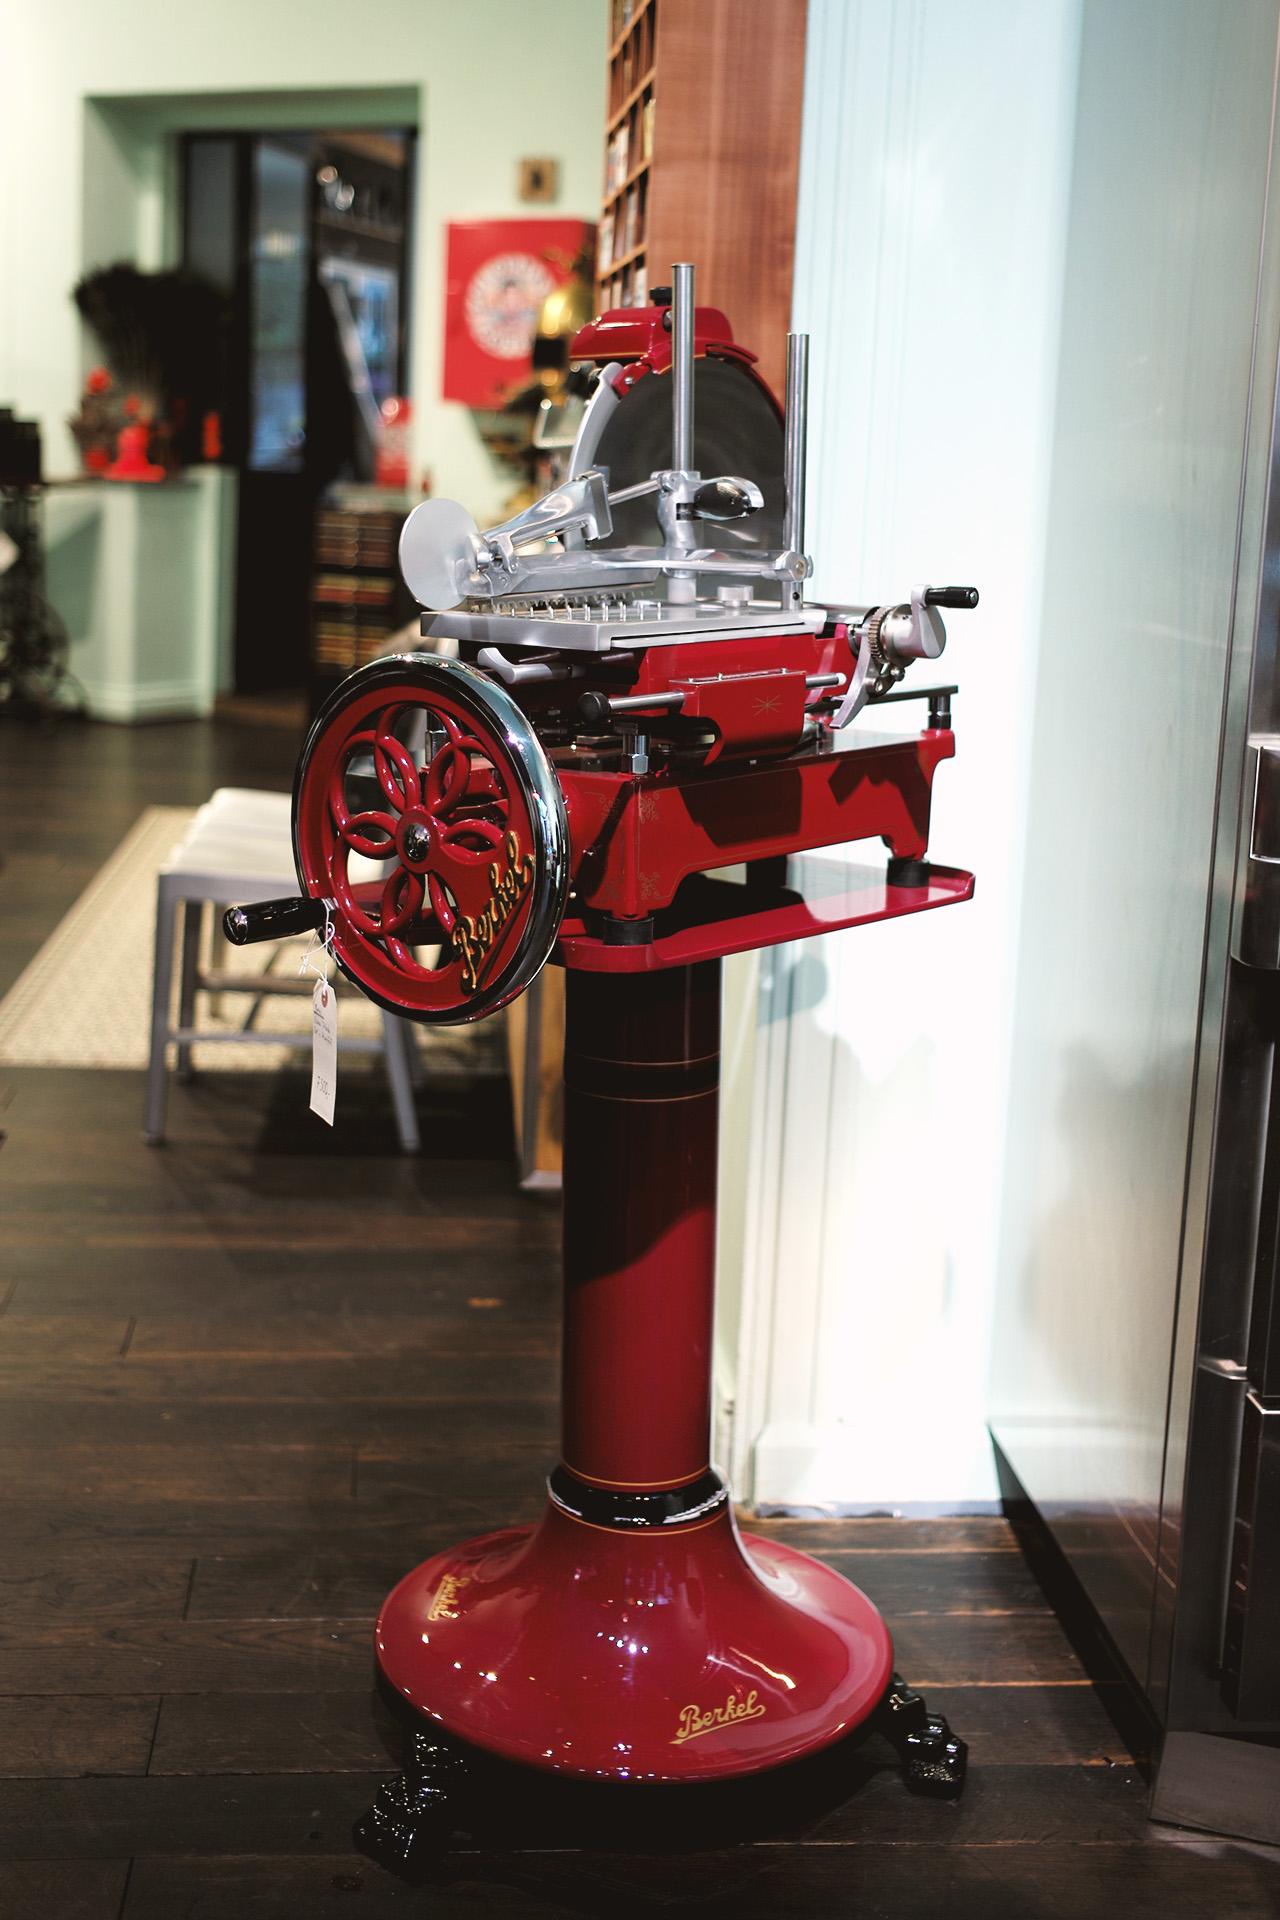 berkel-aufschnittmaschine-mechanisch-aufschnitt-italien-heritage